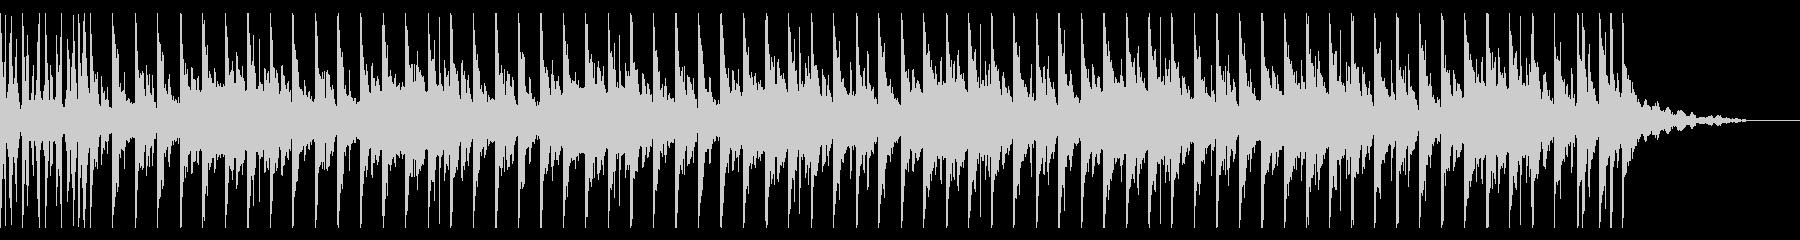 150 BPMの未再生の波形